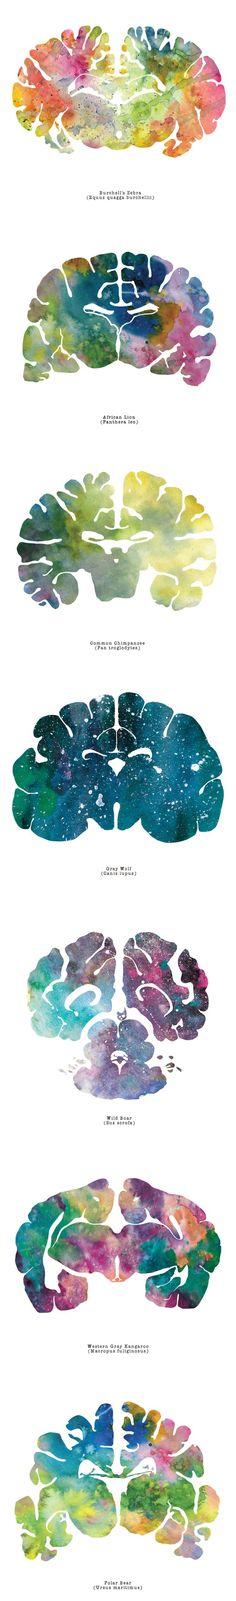 Artist watercolors animal brain scans. Simply stunning!